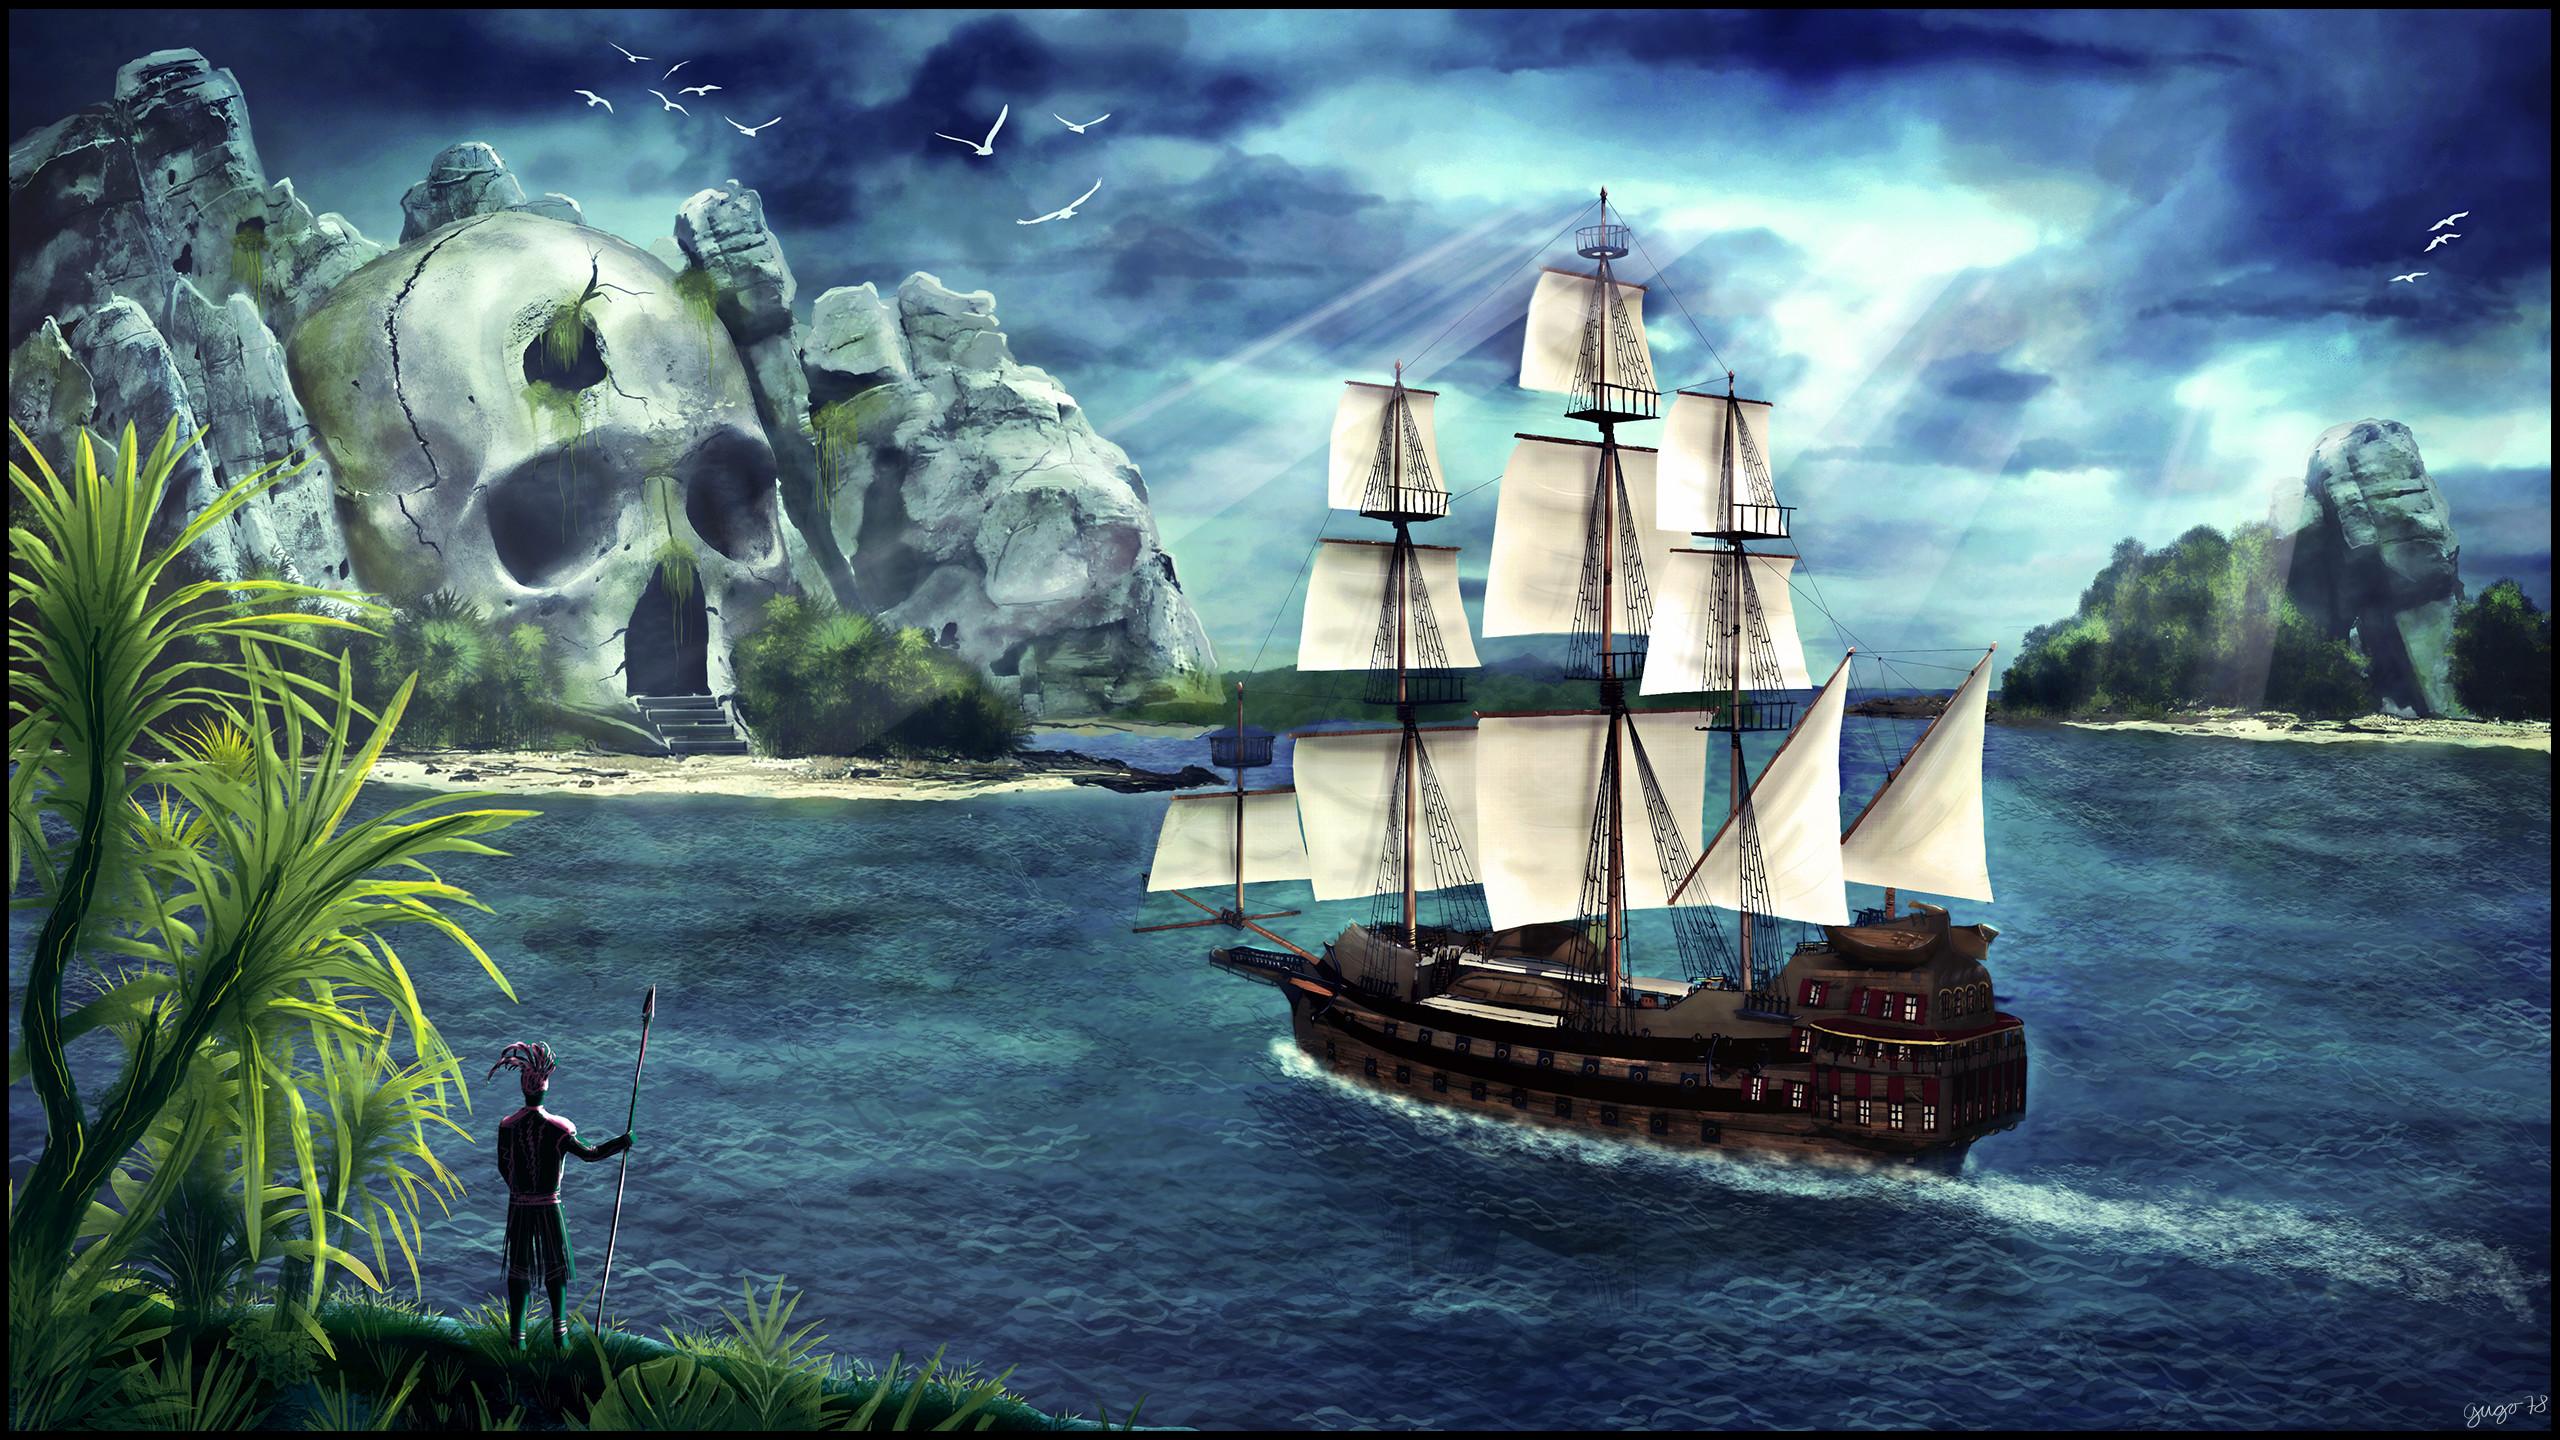 Pirate Ship Skull